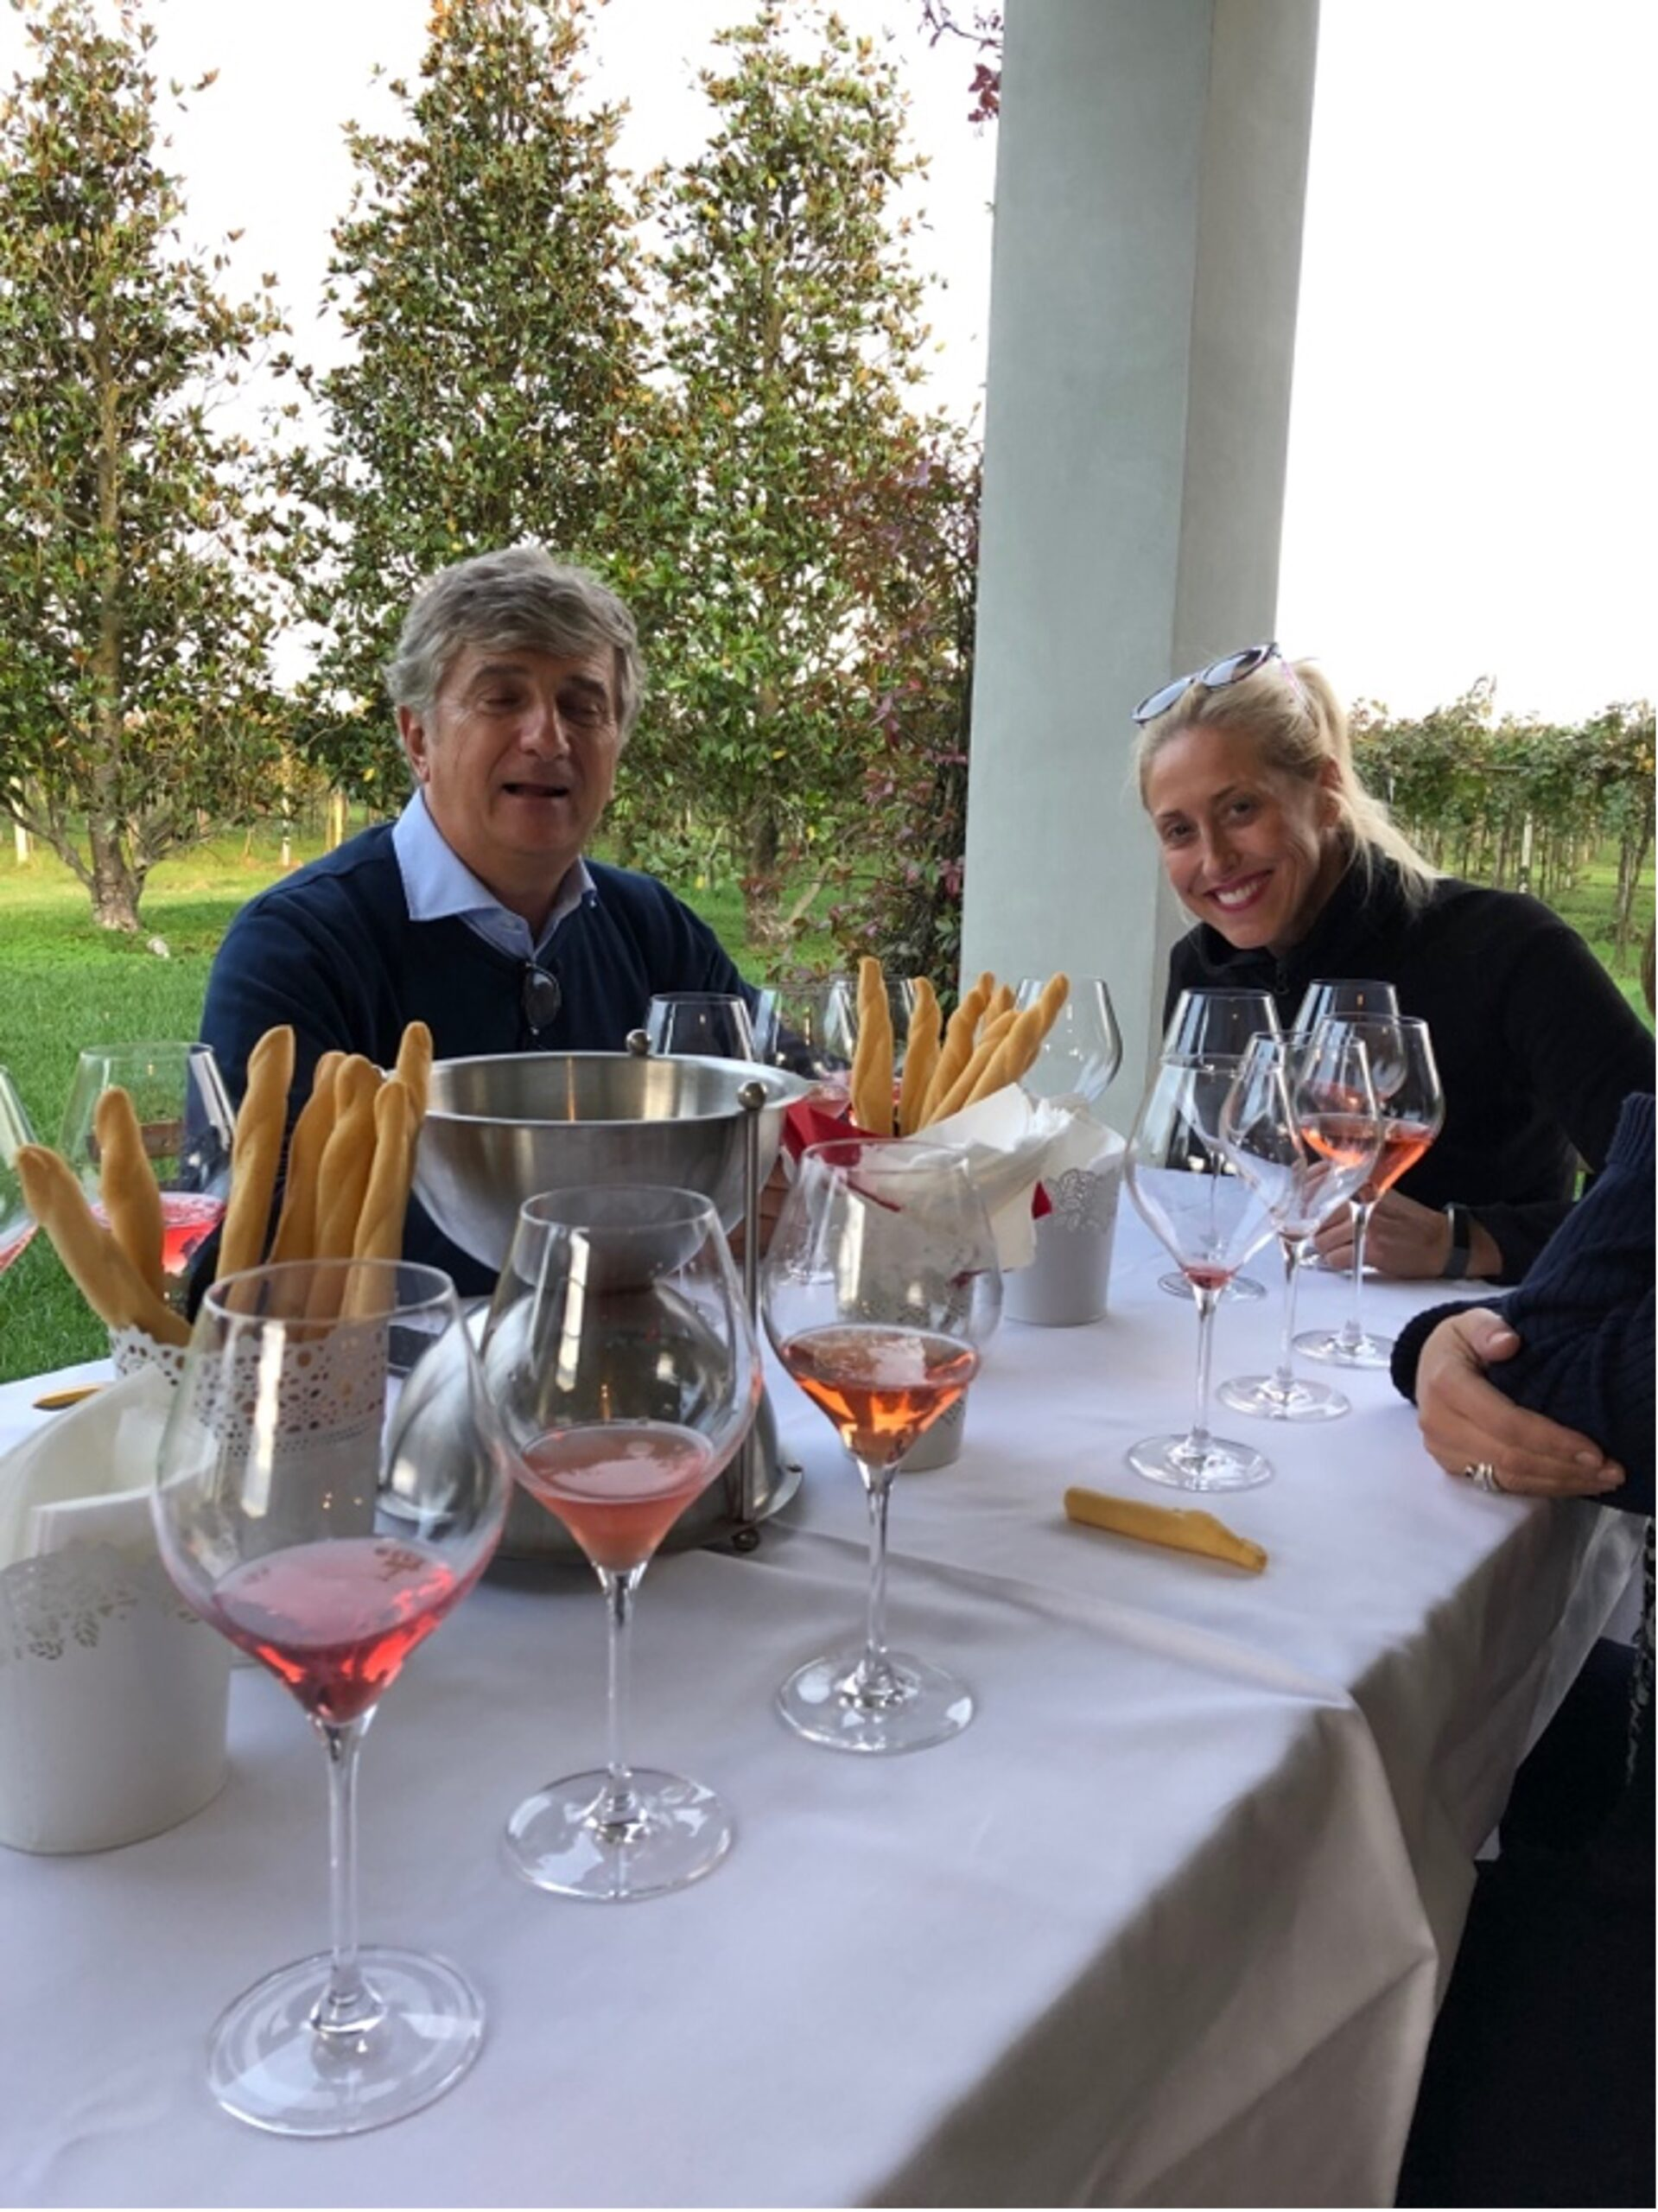 Lambrusco di Sorbara at Cavicchioli Vineyards with the winemaker. Photo by Vinotalia